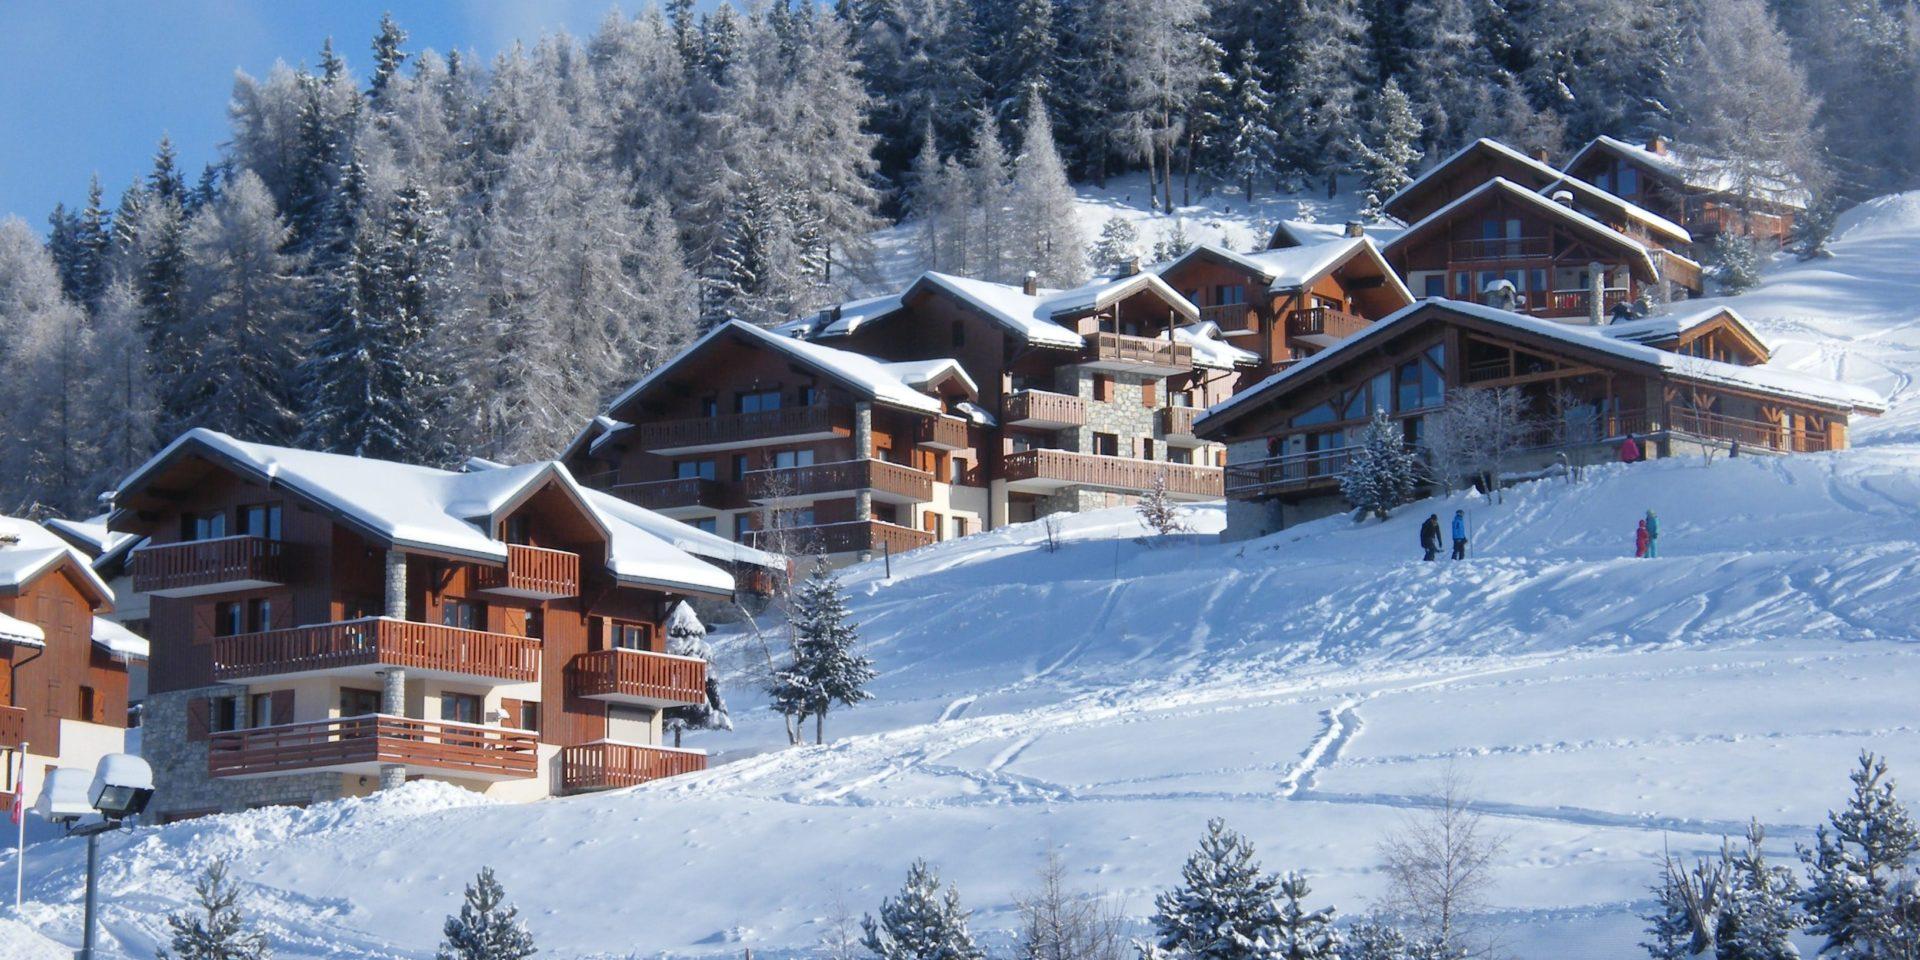 Vallandry Paradiski Frankrijk wintersport skivakantie luxe chalets bomen bergen sneeuw piste skien